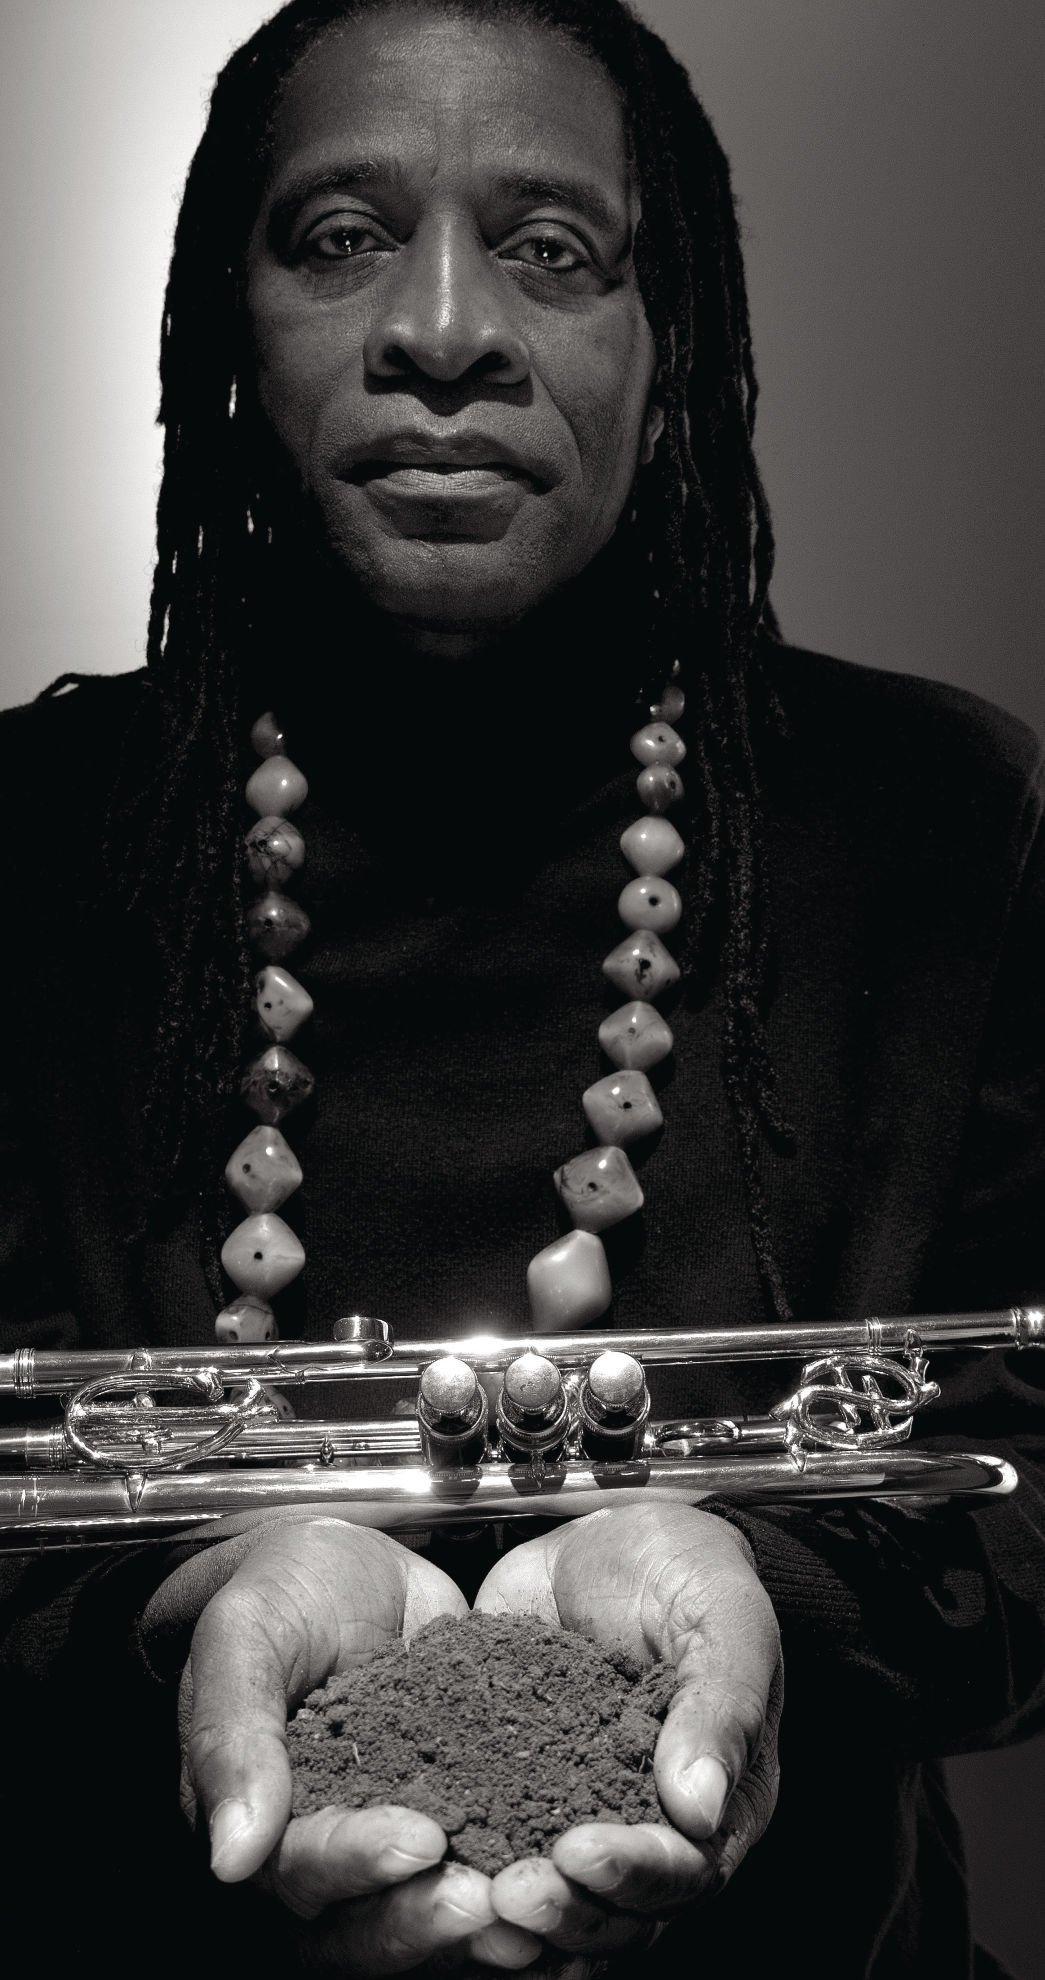 Hannibal Lokumbe Hannibal - Daniel Barenboim Barenboim African Portraits